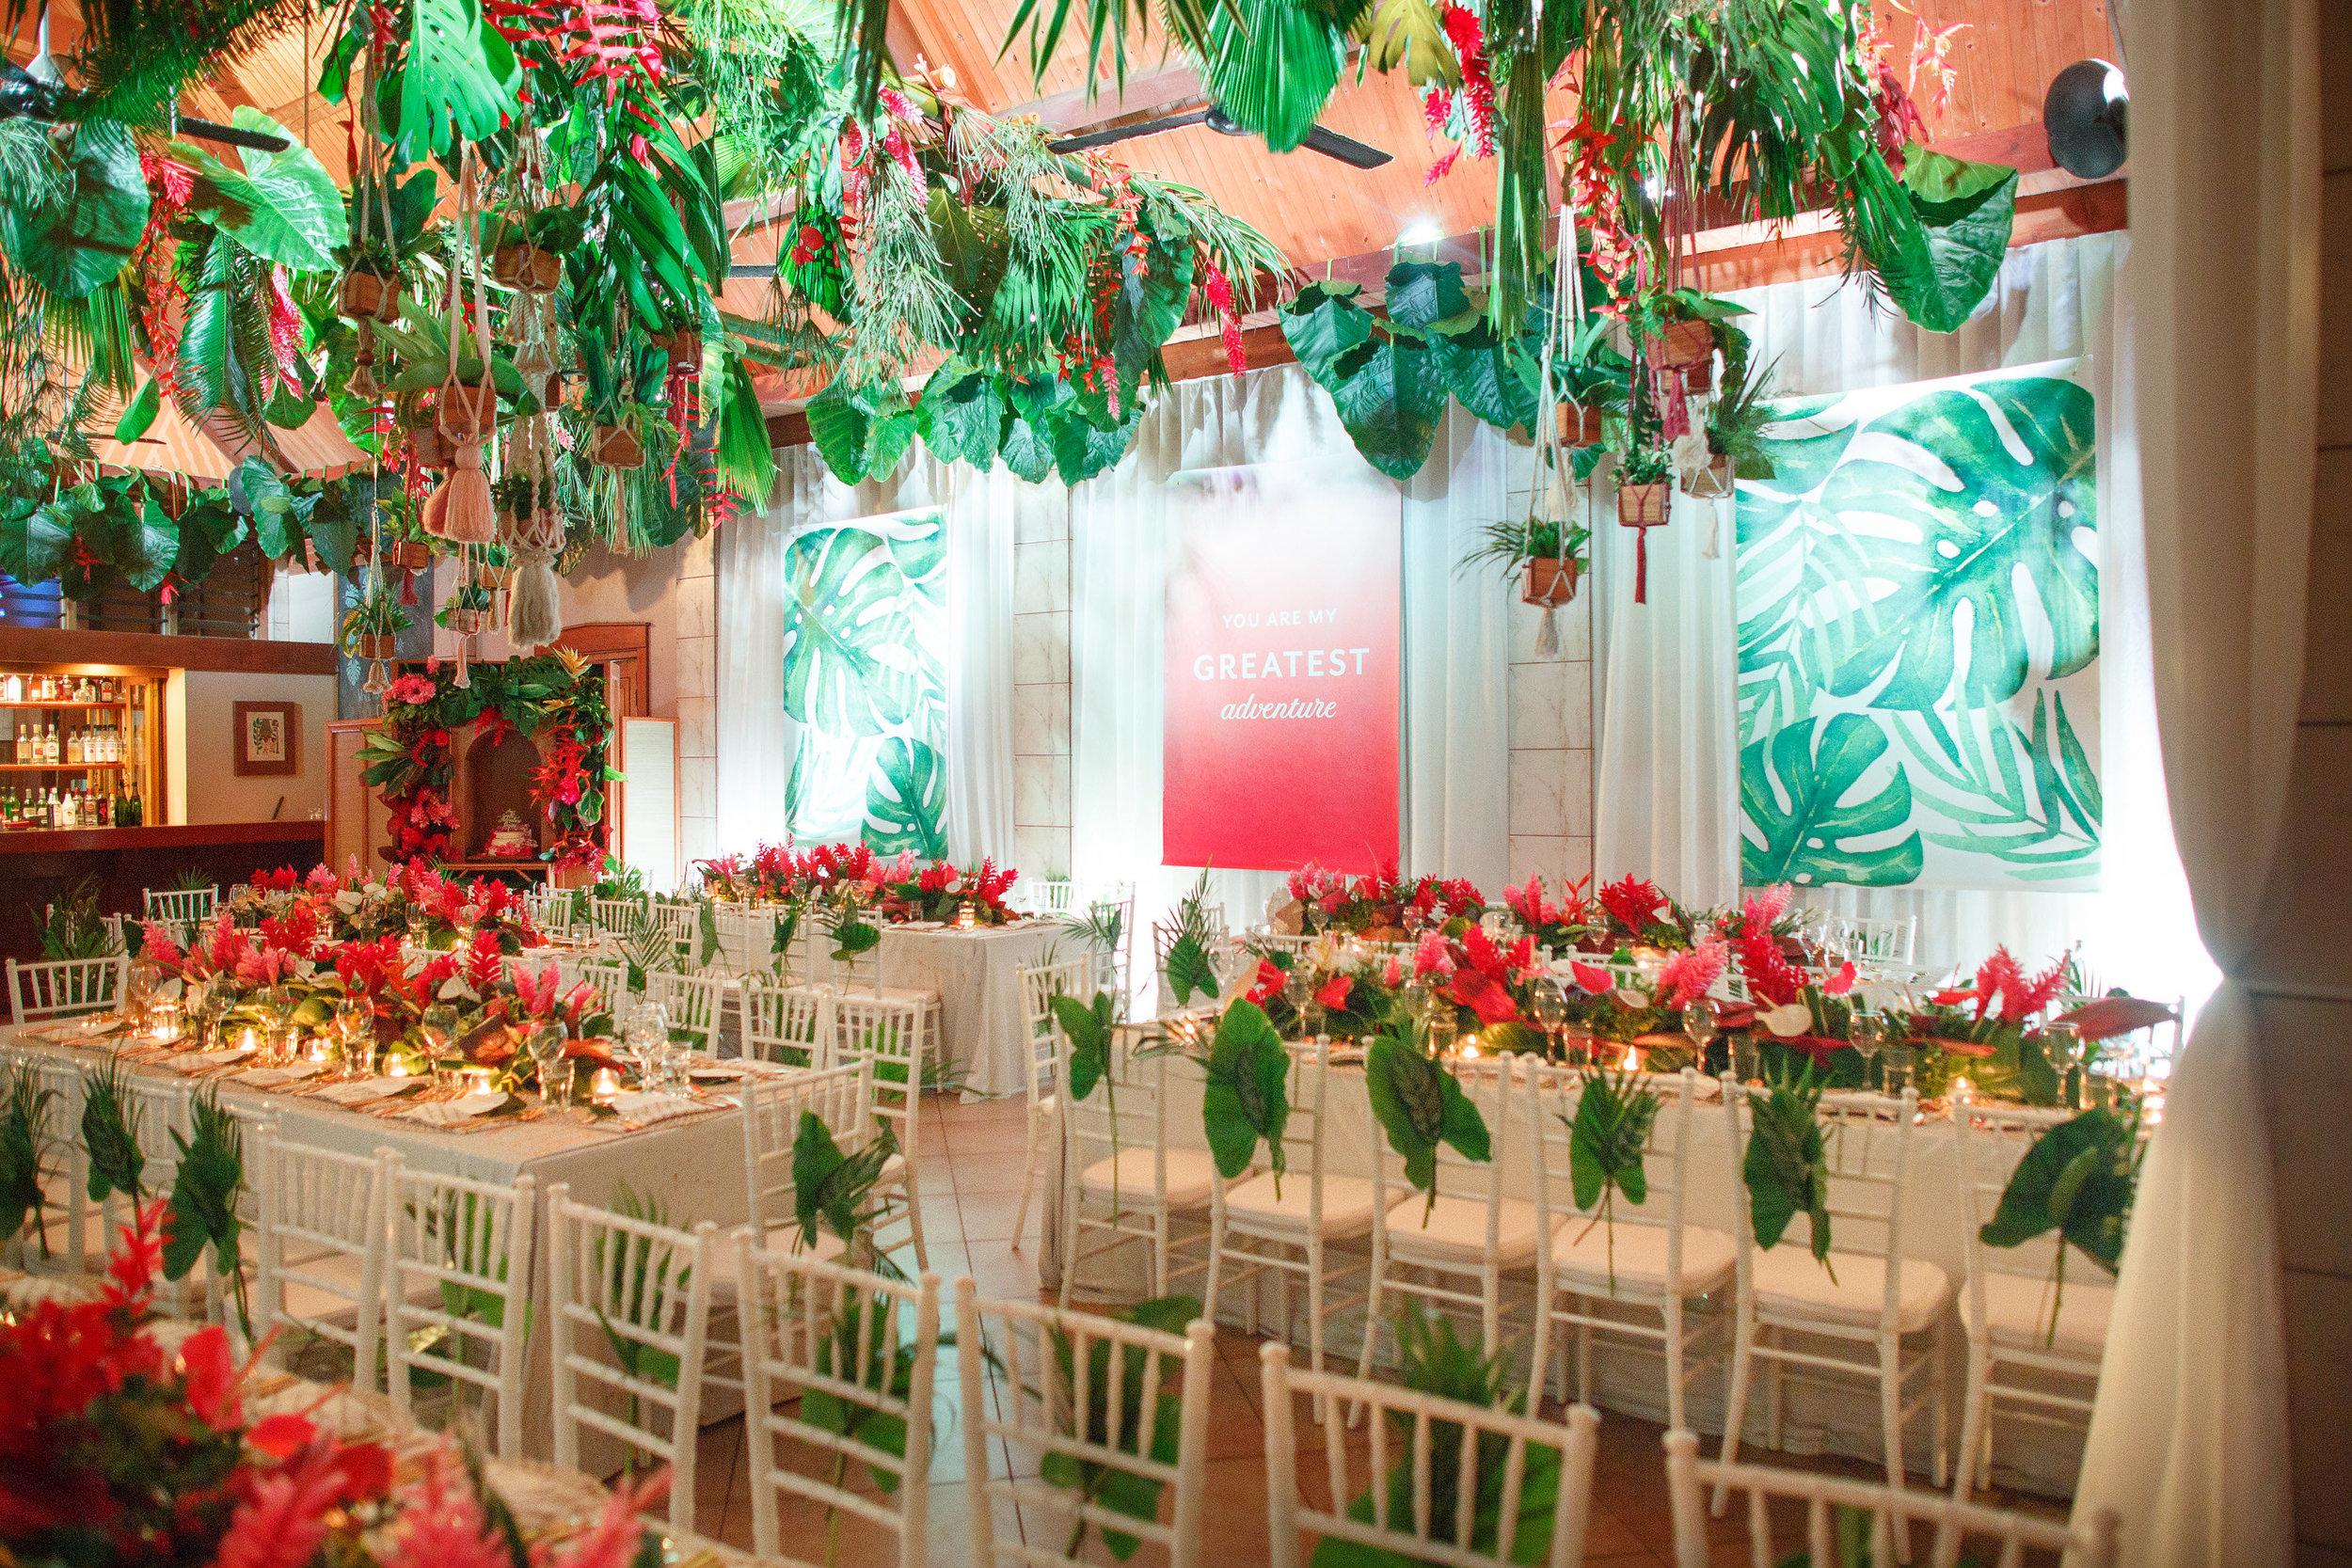 Fiji_destination_wedding_centrepiece_fresh_flowers_charger_plate_gold_cutlery_tiffany_chairs_tropical.jpg